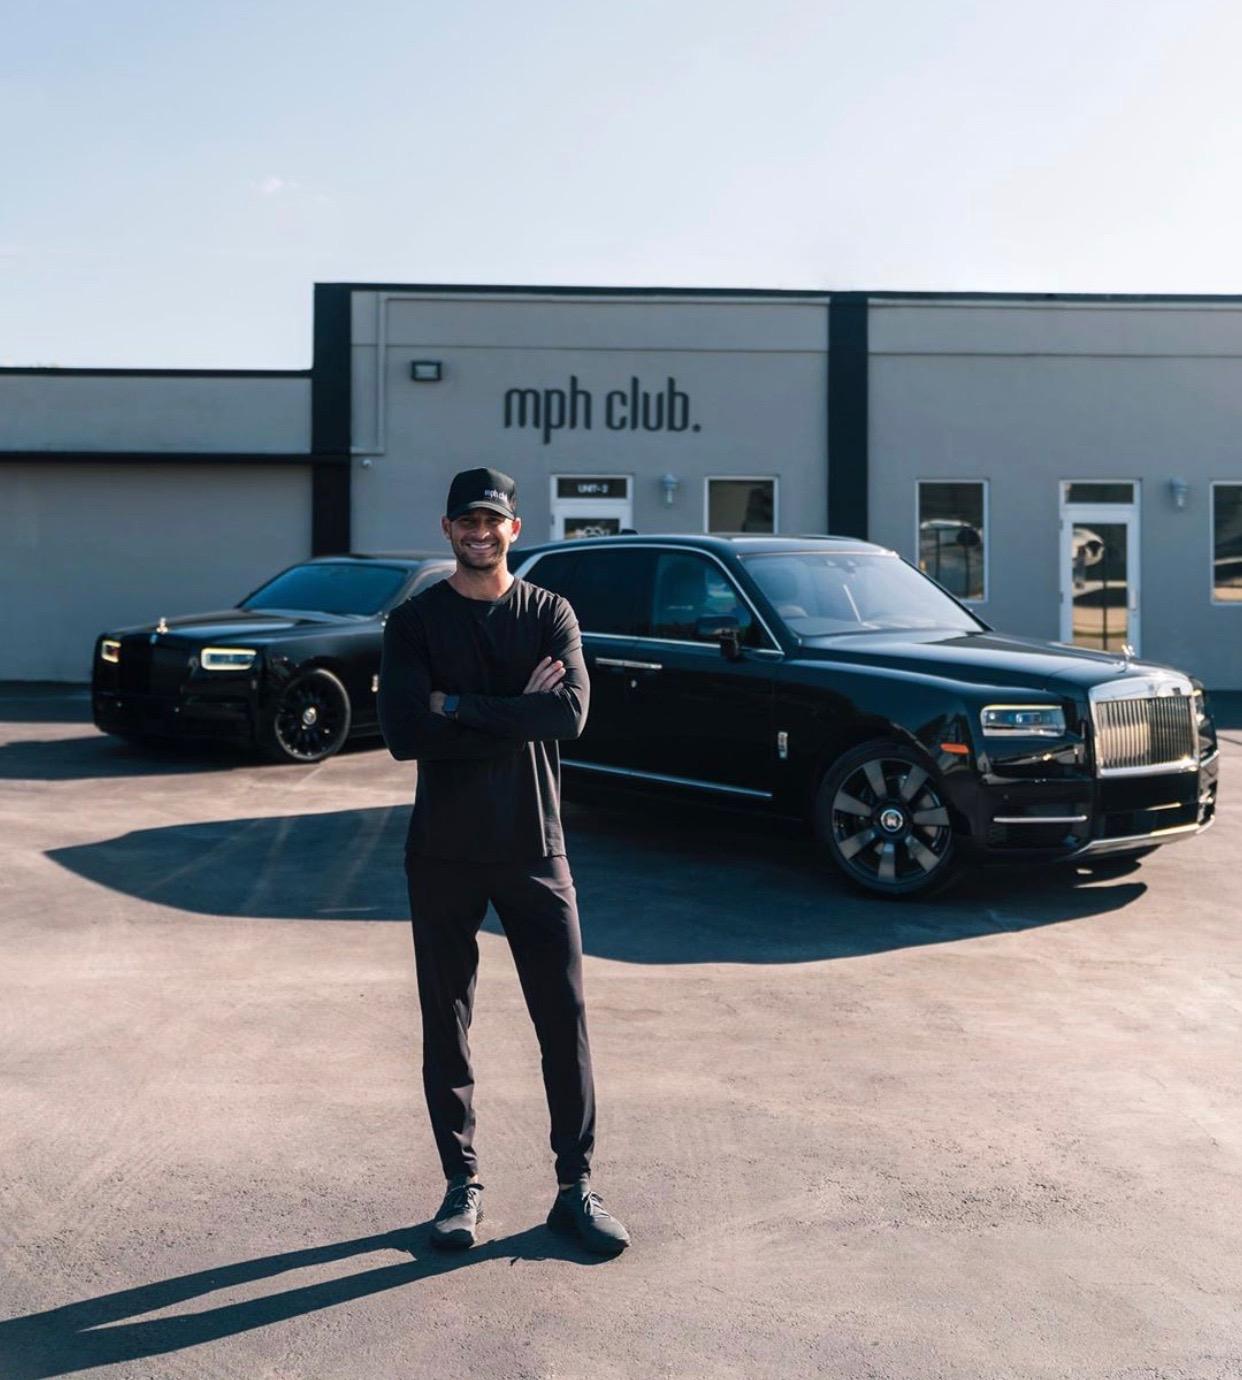 Custom luxury vehicle fanatic Liram Sustiel donates his Lamborghini income to charity